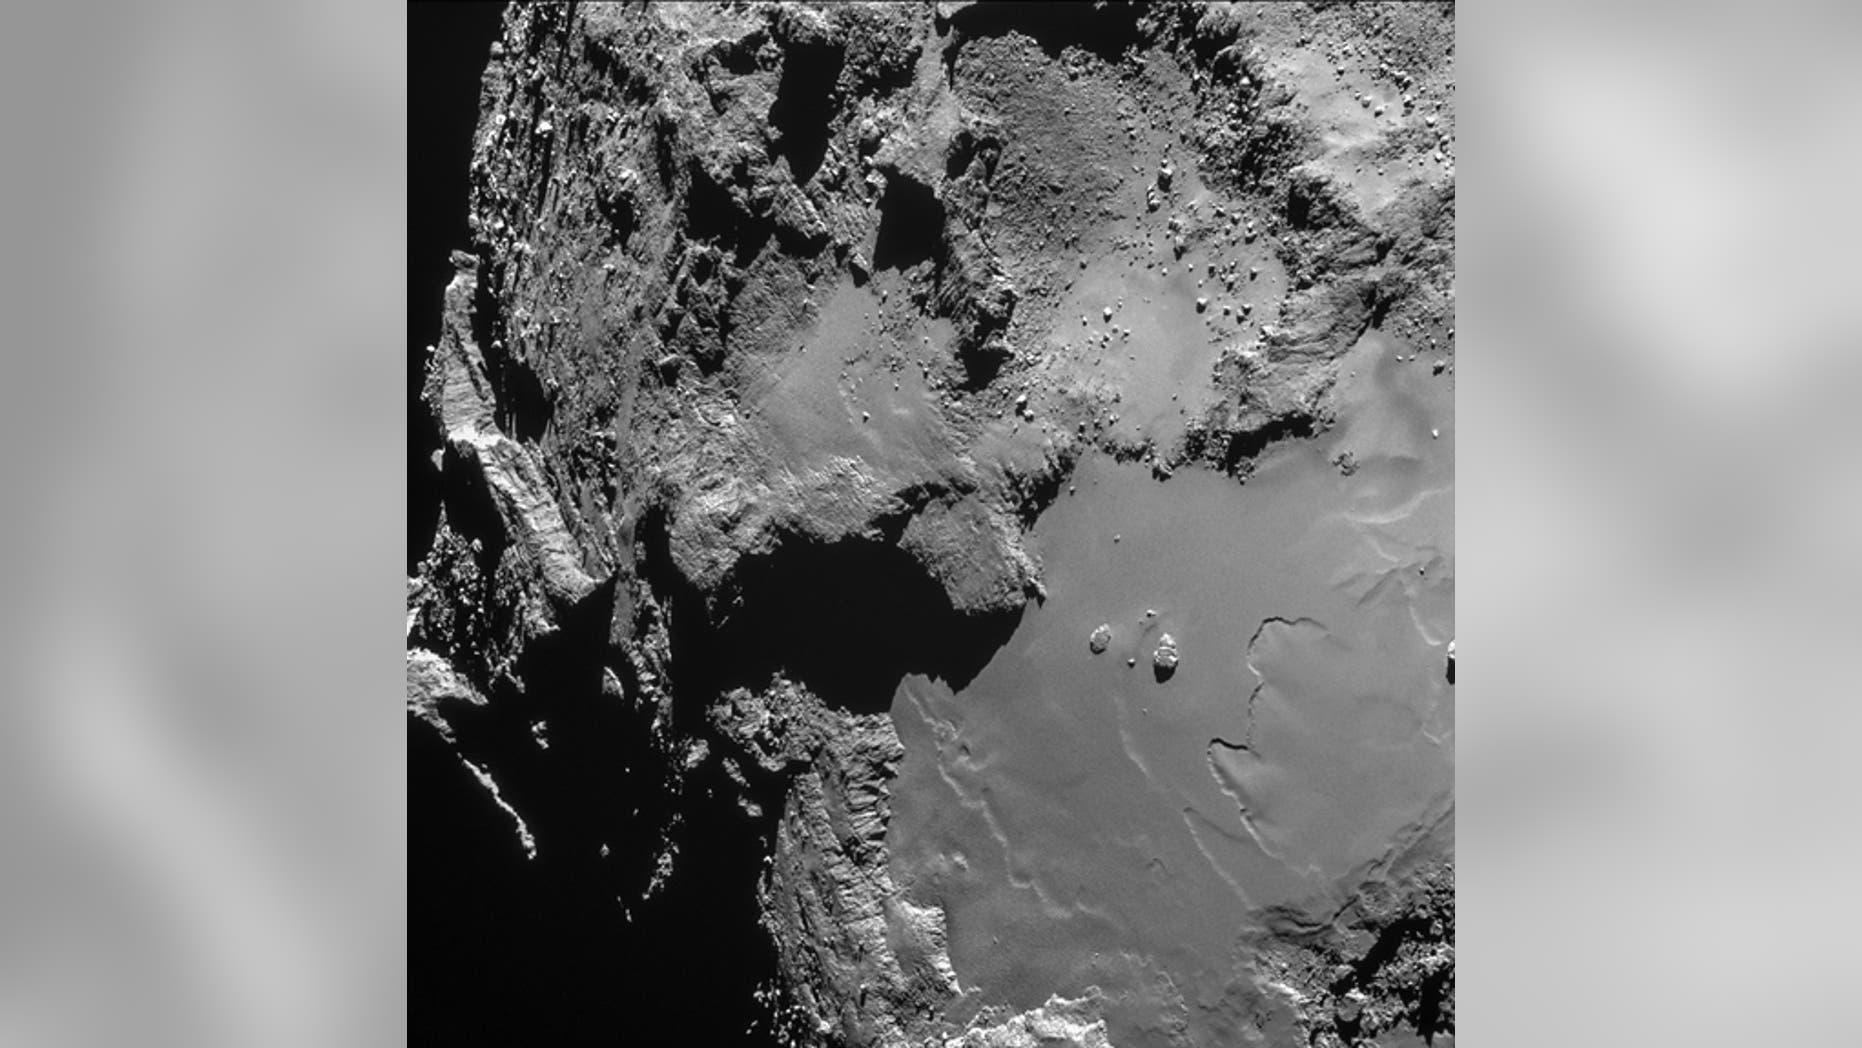 An image of Comet 67P/Churyumov-Gerasimenko taken from 9.5 miles above the surface.